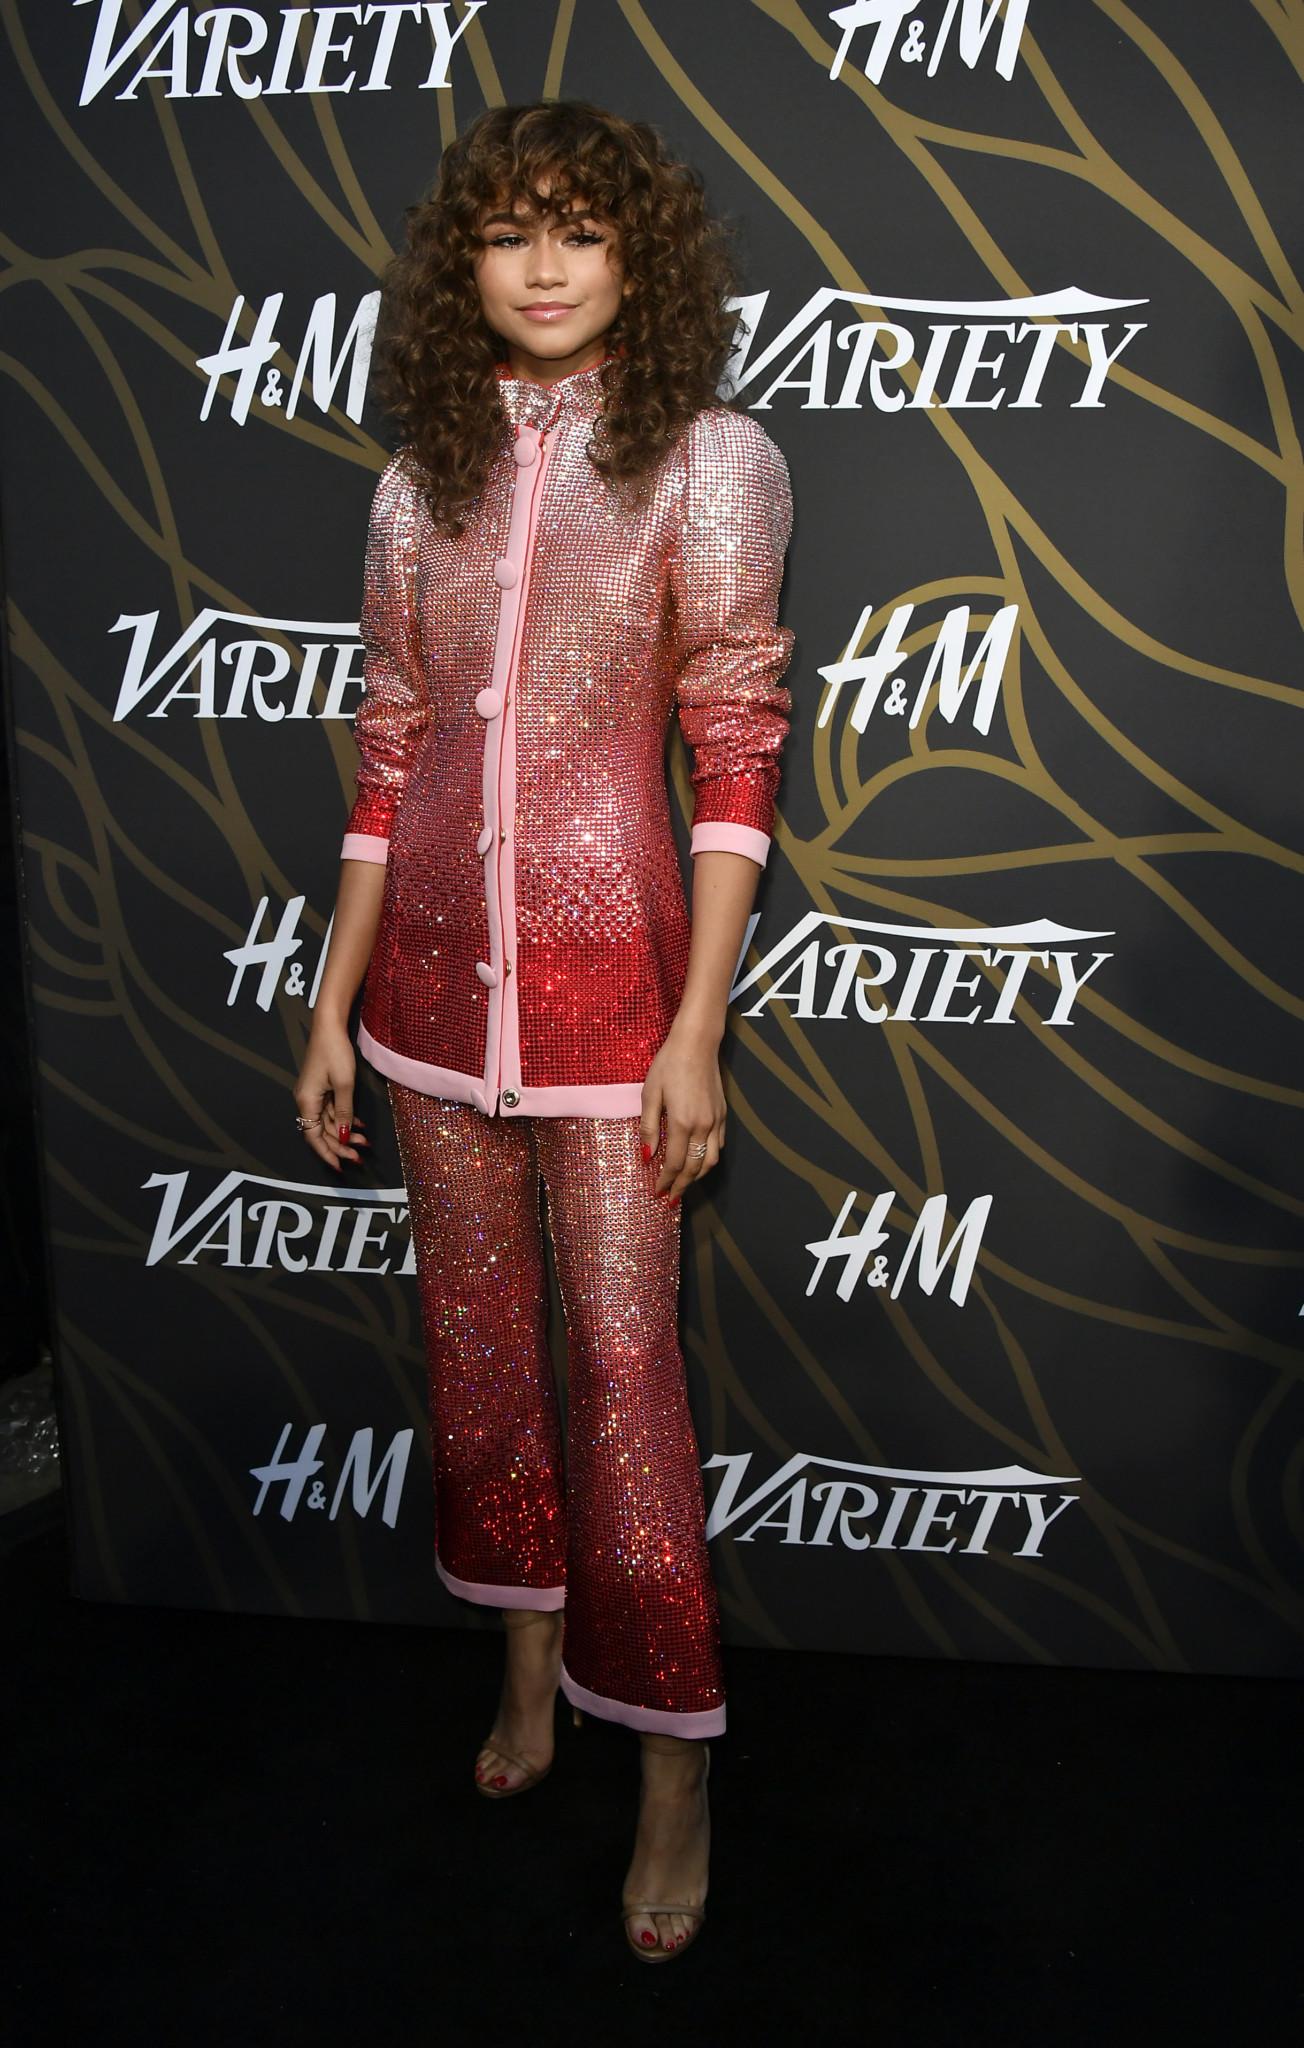 Red Carpet Photos! Zendaya Coleman, Rita Ora, Yara Shahidi attend the 2017 Variety Power of Young Hollywood